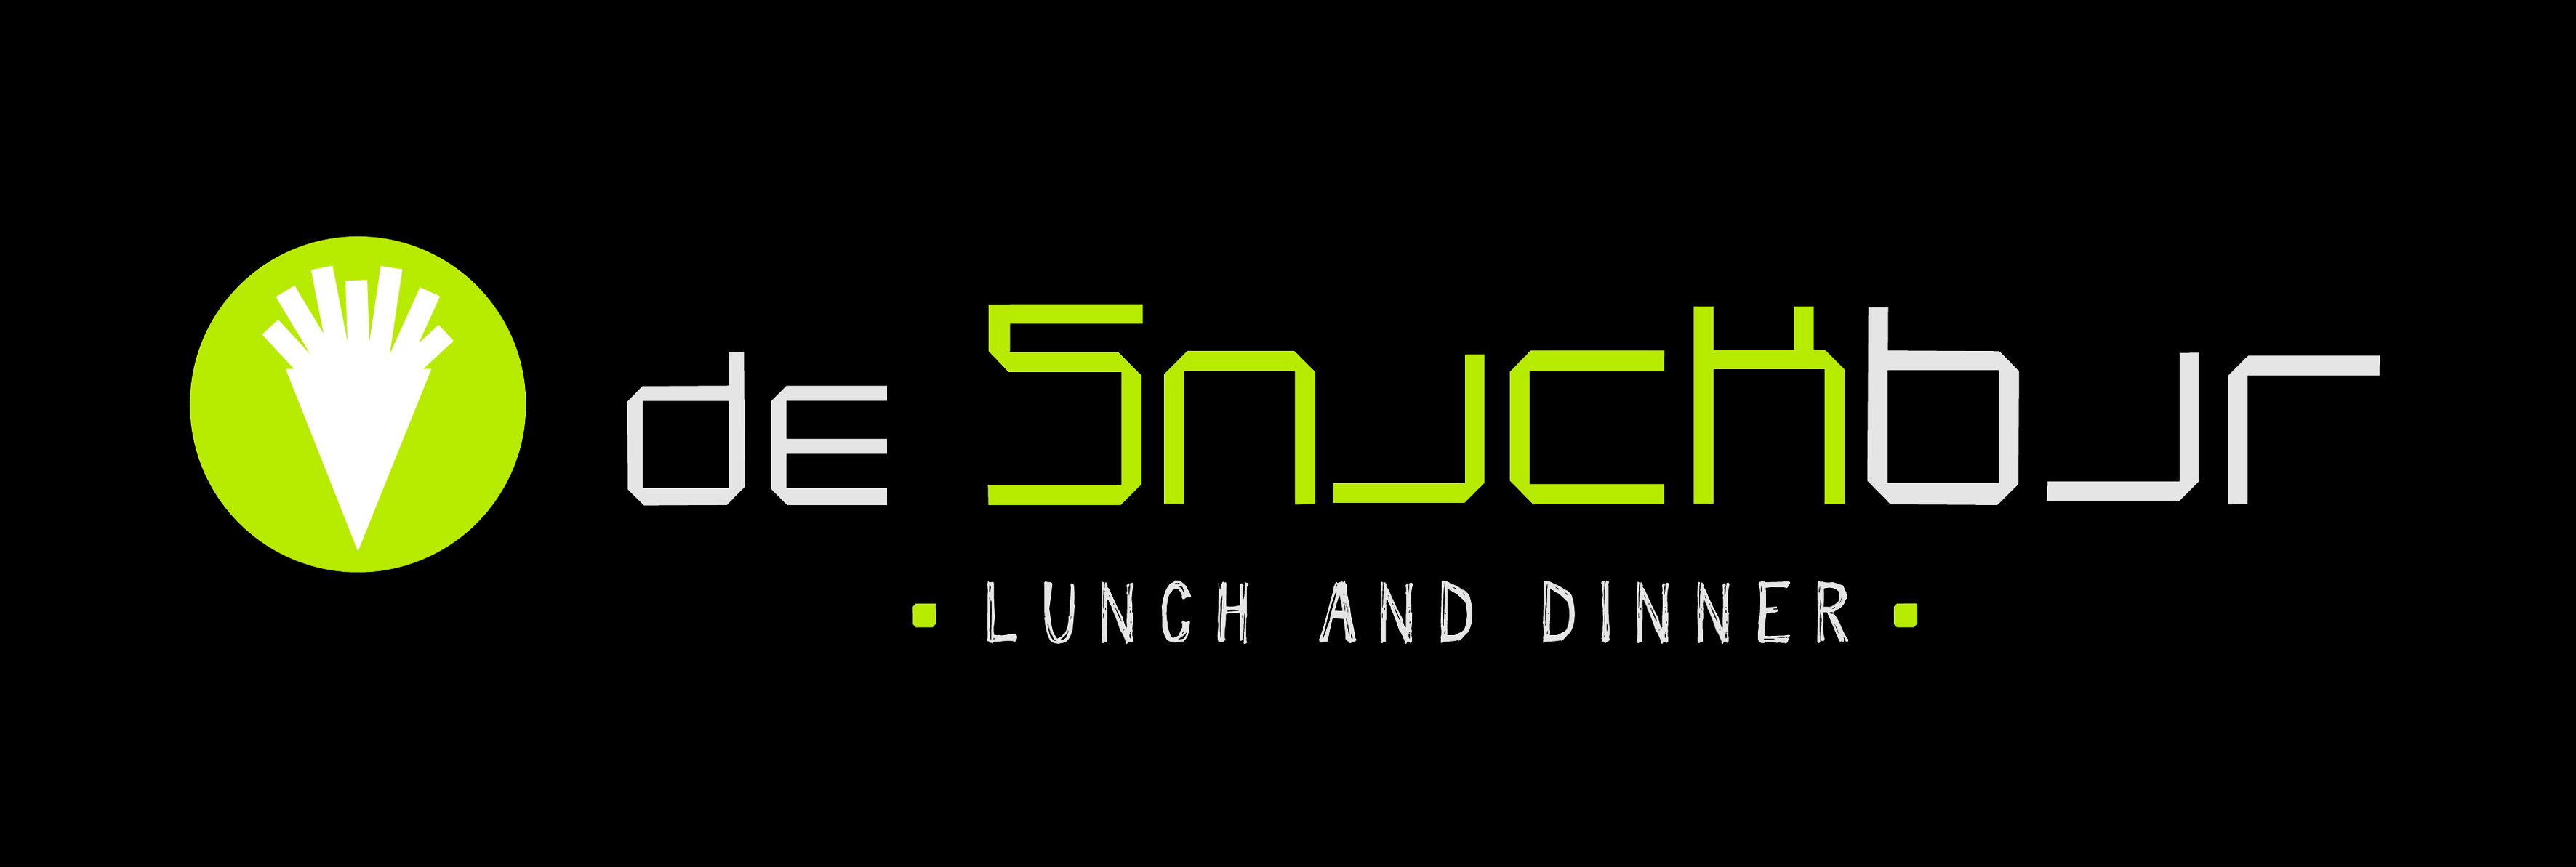 Logo De Snackbar background-black2